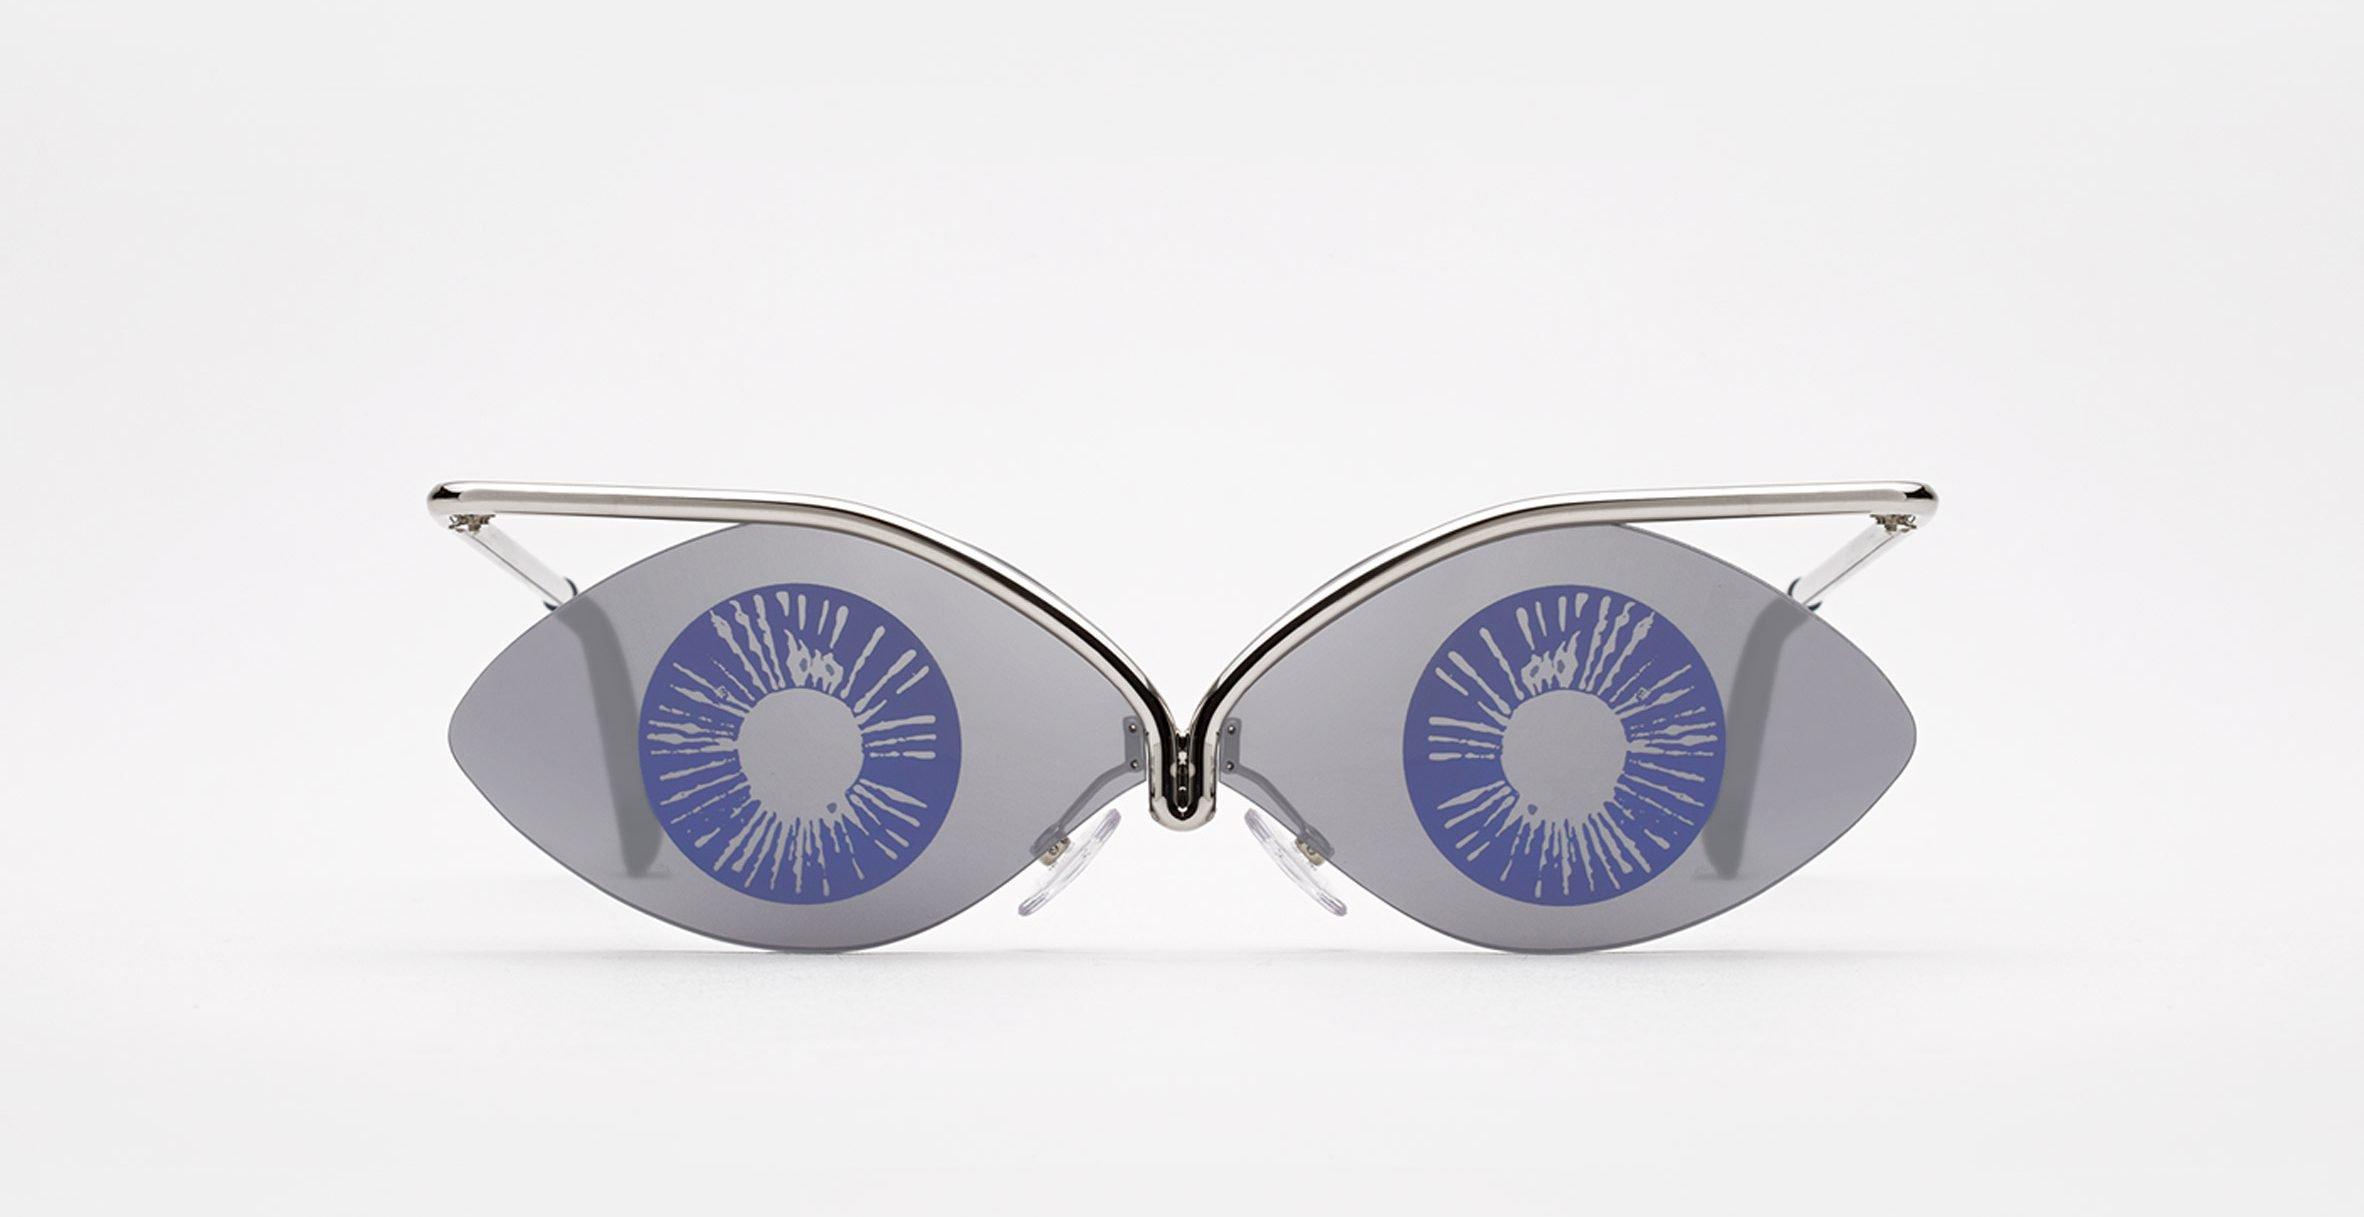 futurystyczne okulary